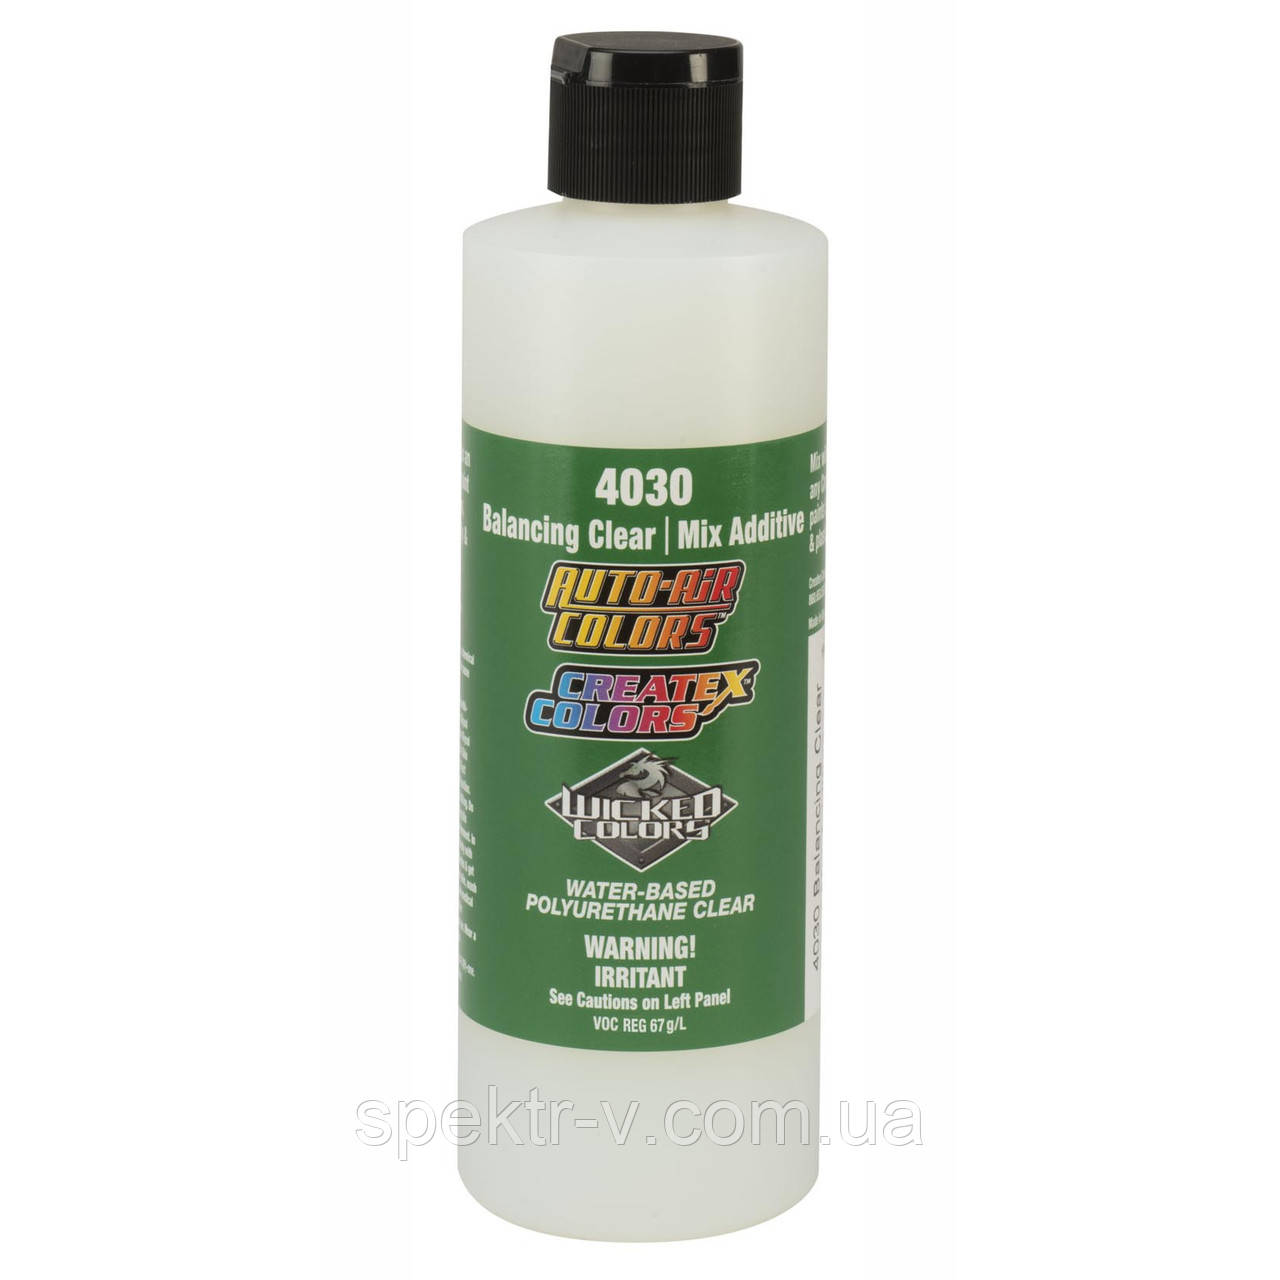 Уретановая добавка для красок Createx 4030 Balancing Clear, 120 мл